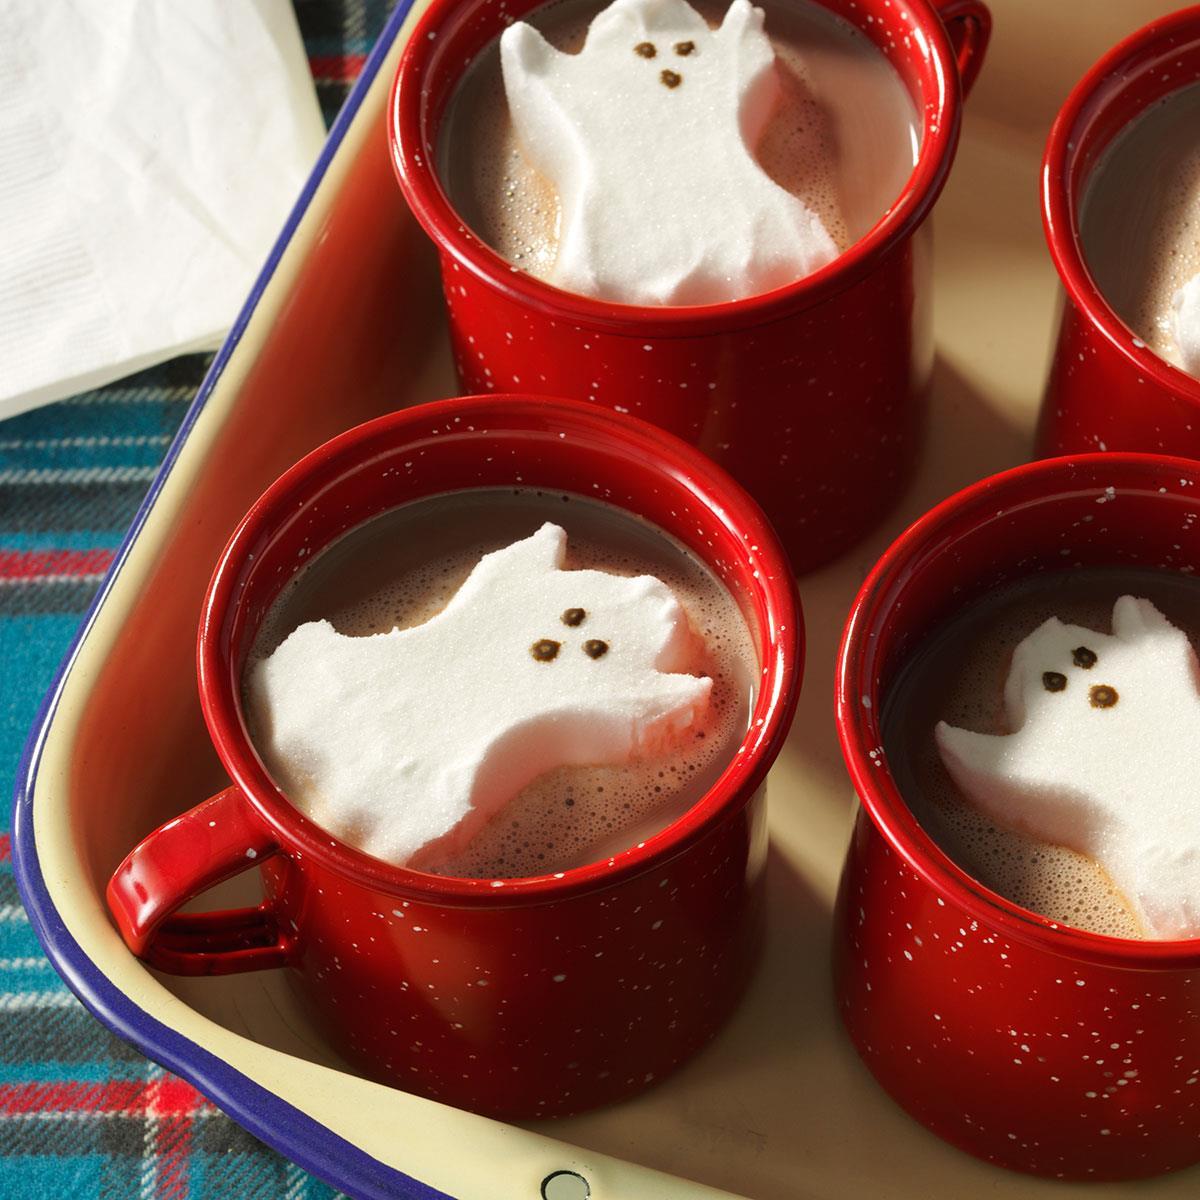 Jiffy Ground Pork Skillet Recipe: Ghostly Hot Cocoa Recipe